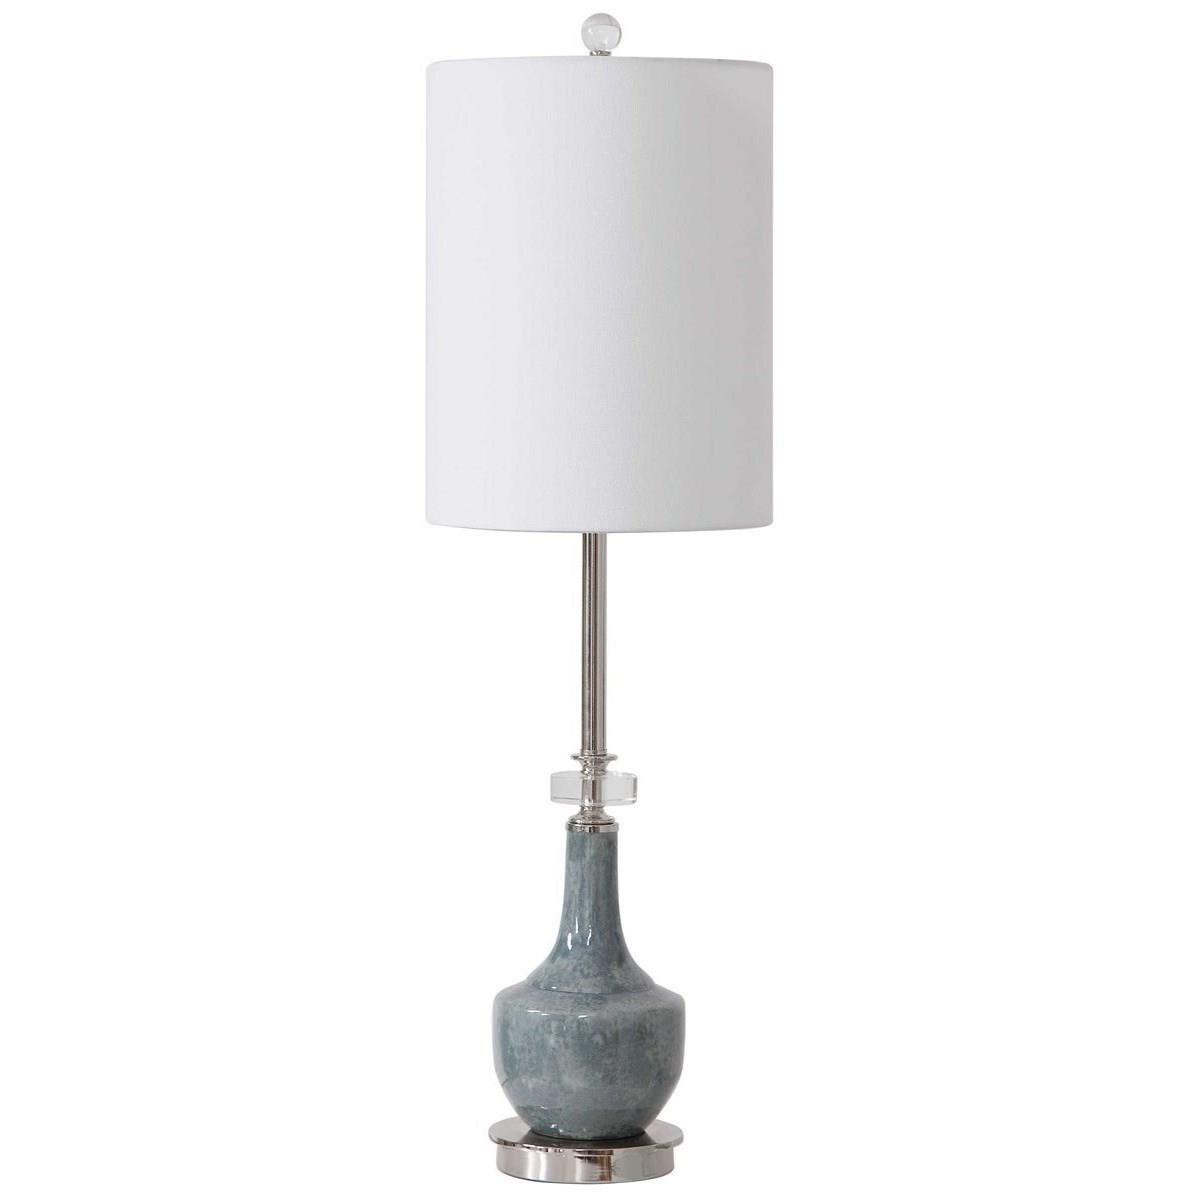 Piers Mottled Blue Buffet Lamp